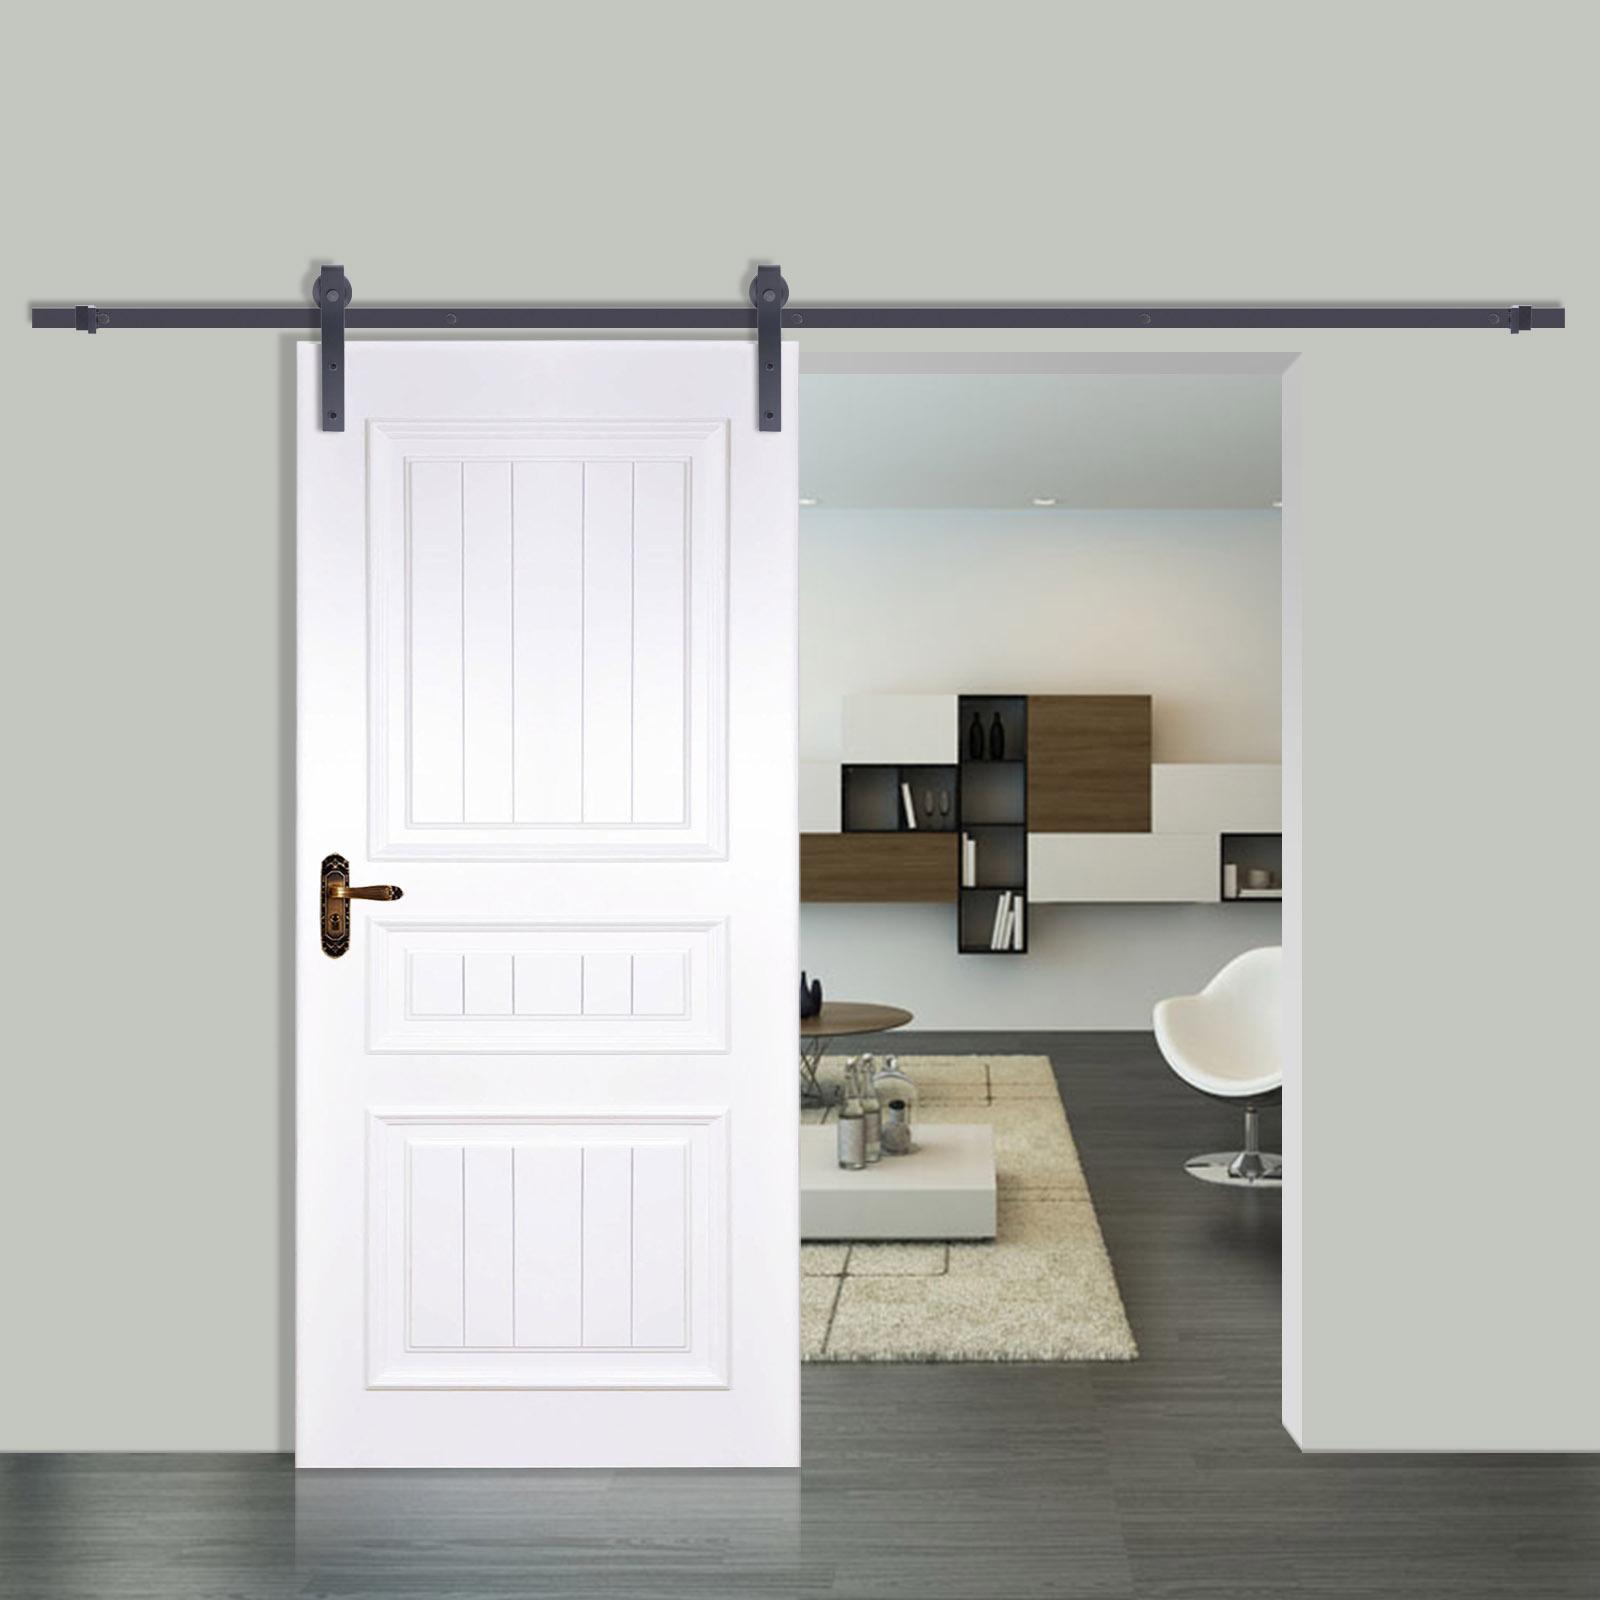 6 6 6 10 12ft rustic black double sliding barn door hardware wheel track kit new ebay. Black Bedroom Furniture Sets. Home Design Ideas